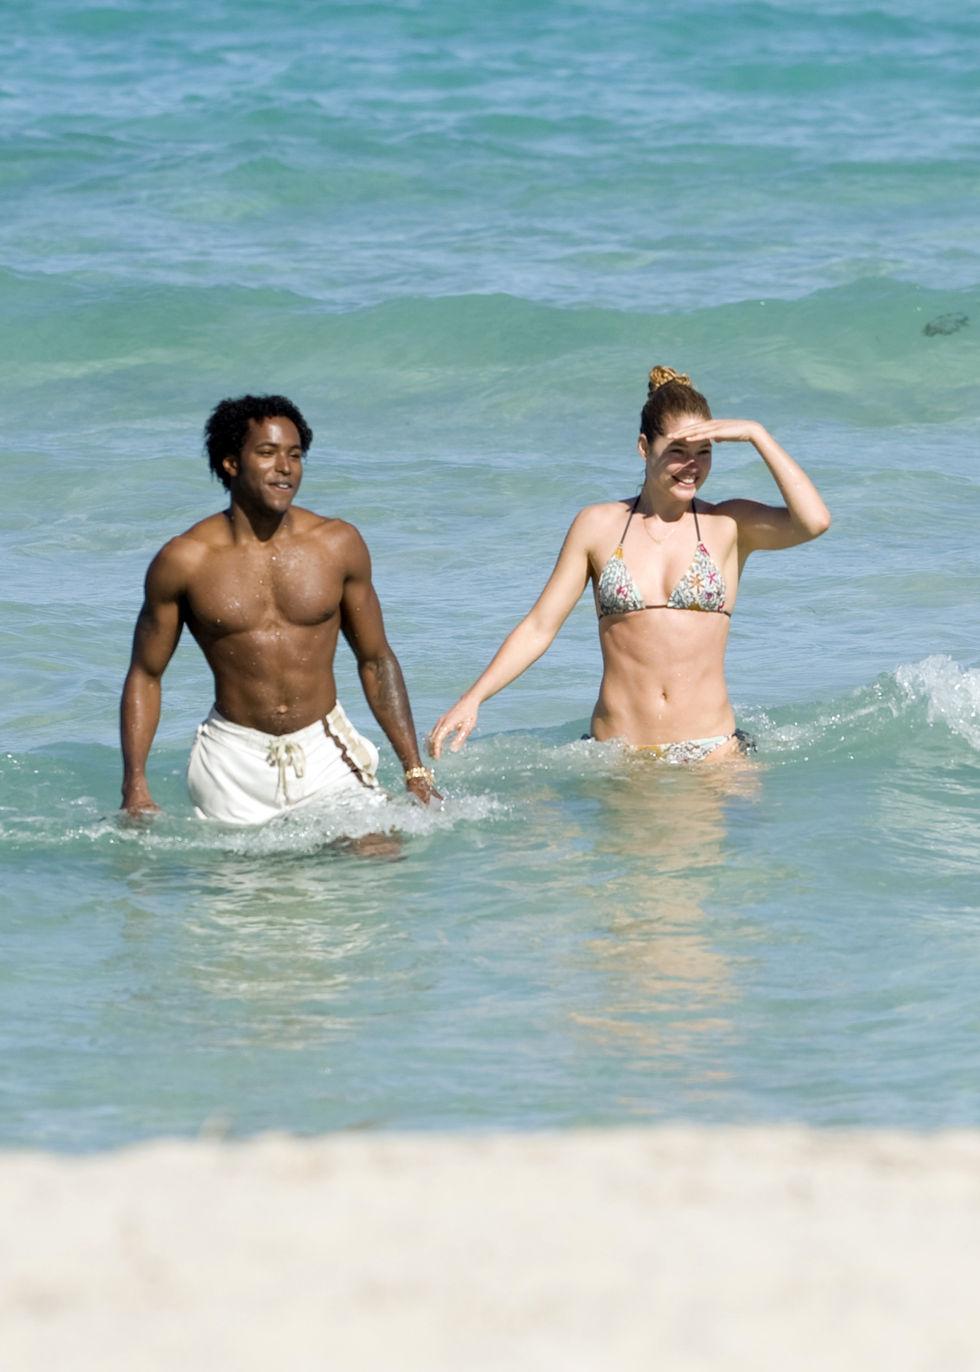 doutzen-kroes-bikini-candis-at-the-beach-in-miami-01